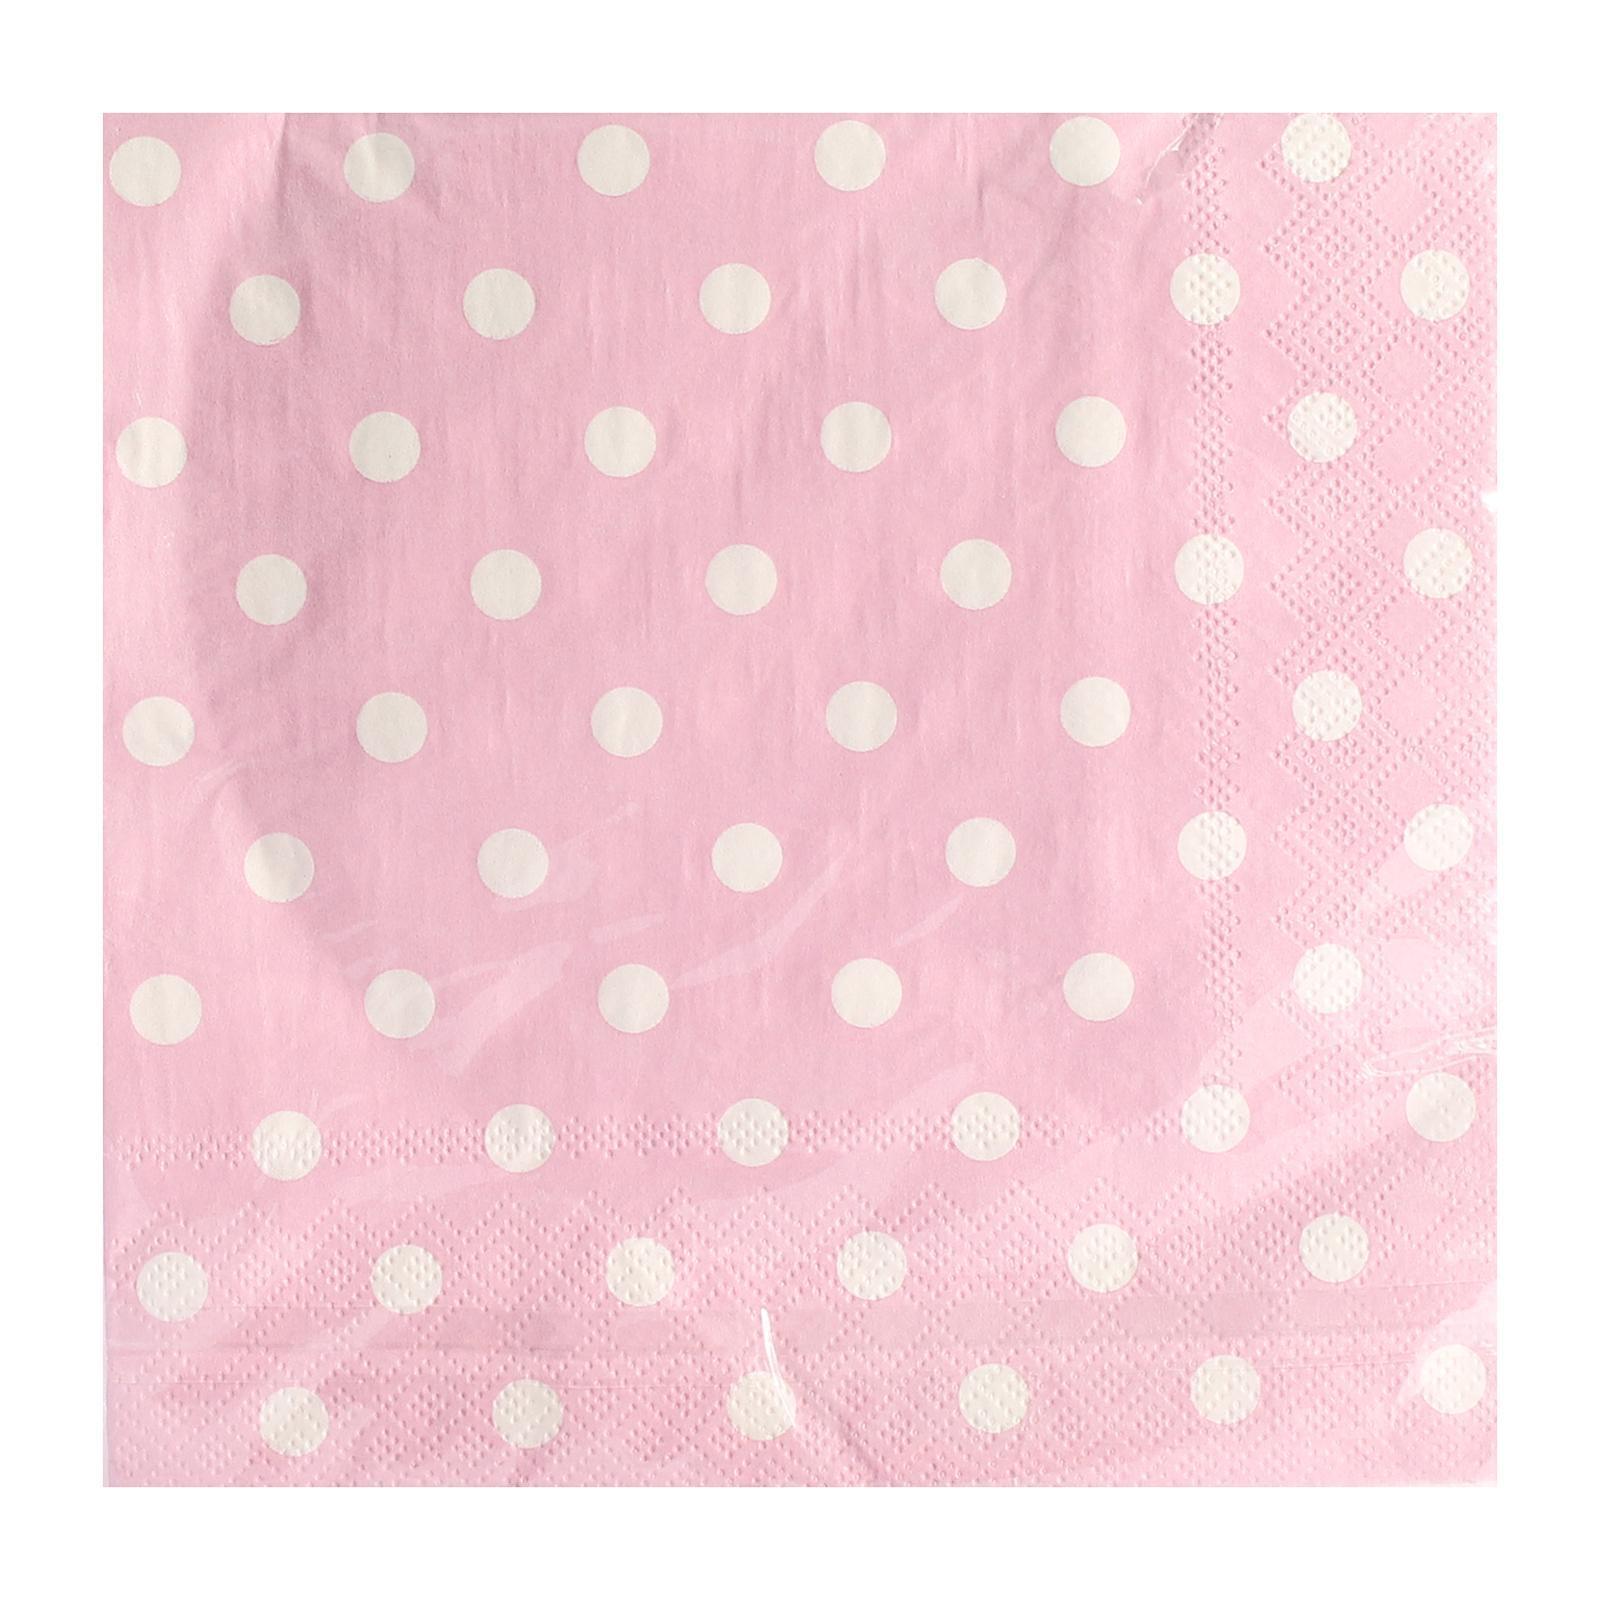 Partyforte 20S 2-Ply Pink Polka Dot Paper Napkins 33x33Cm